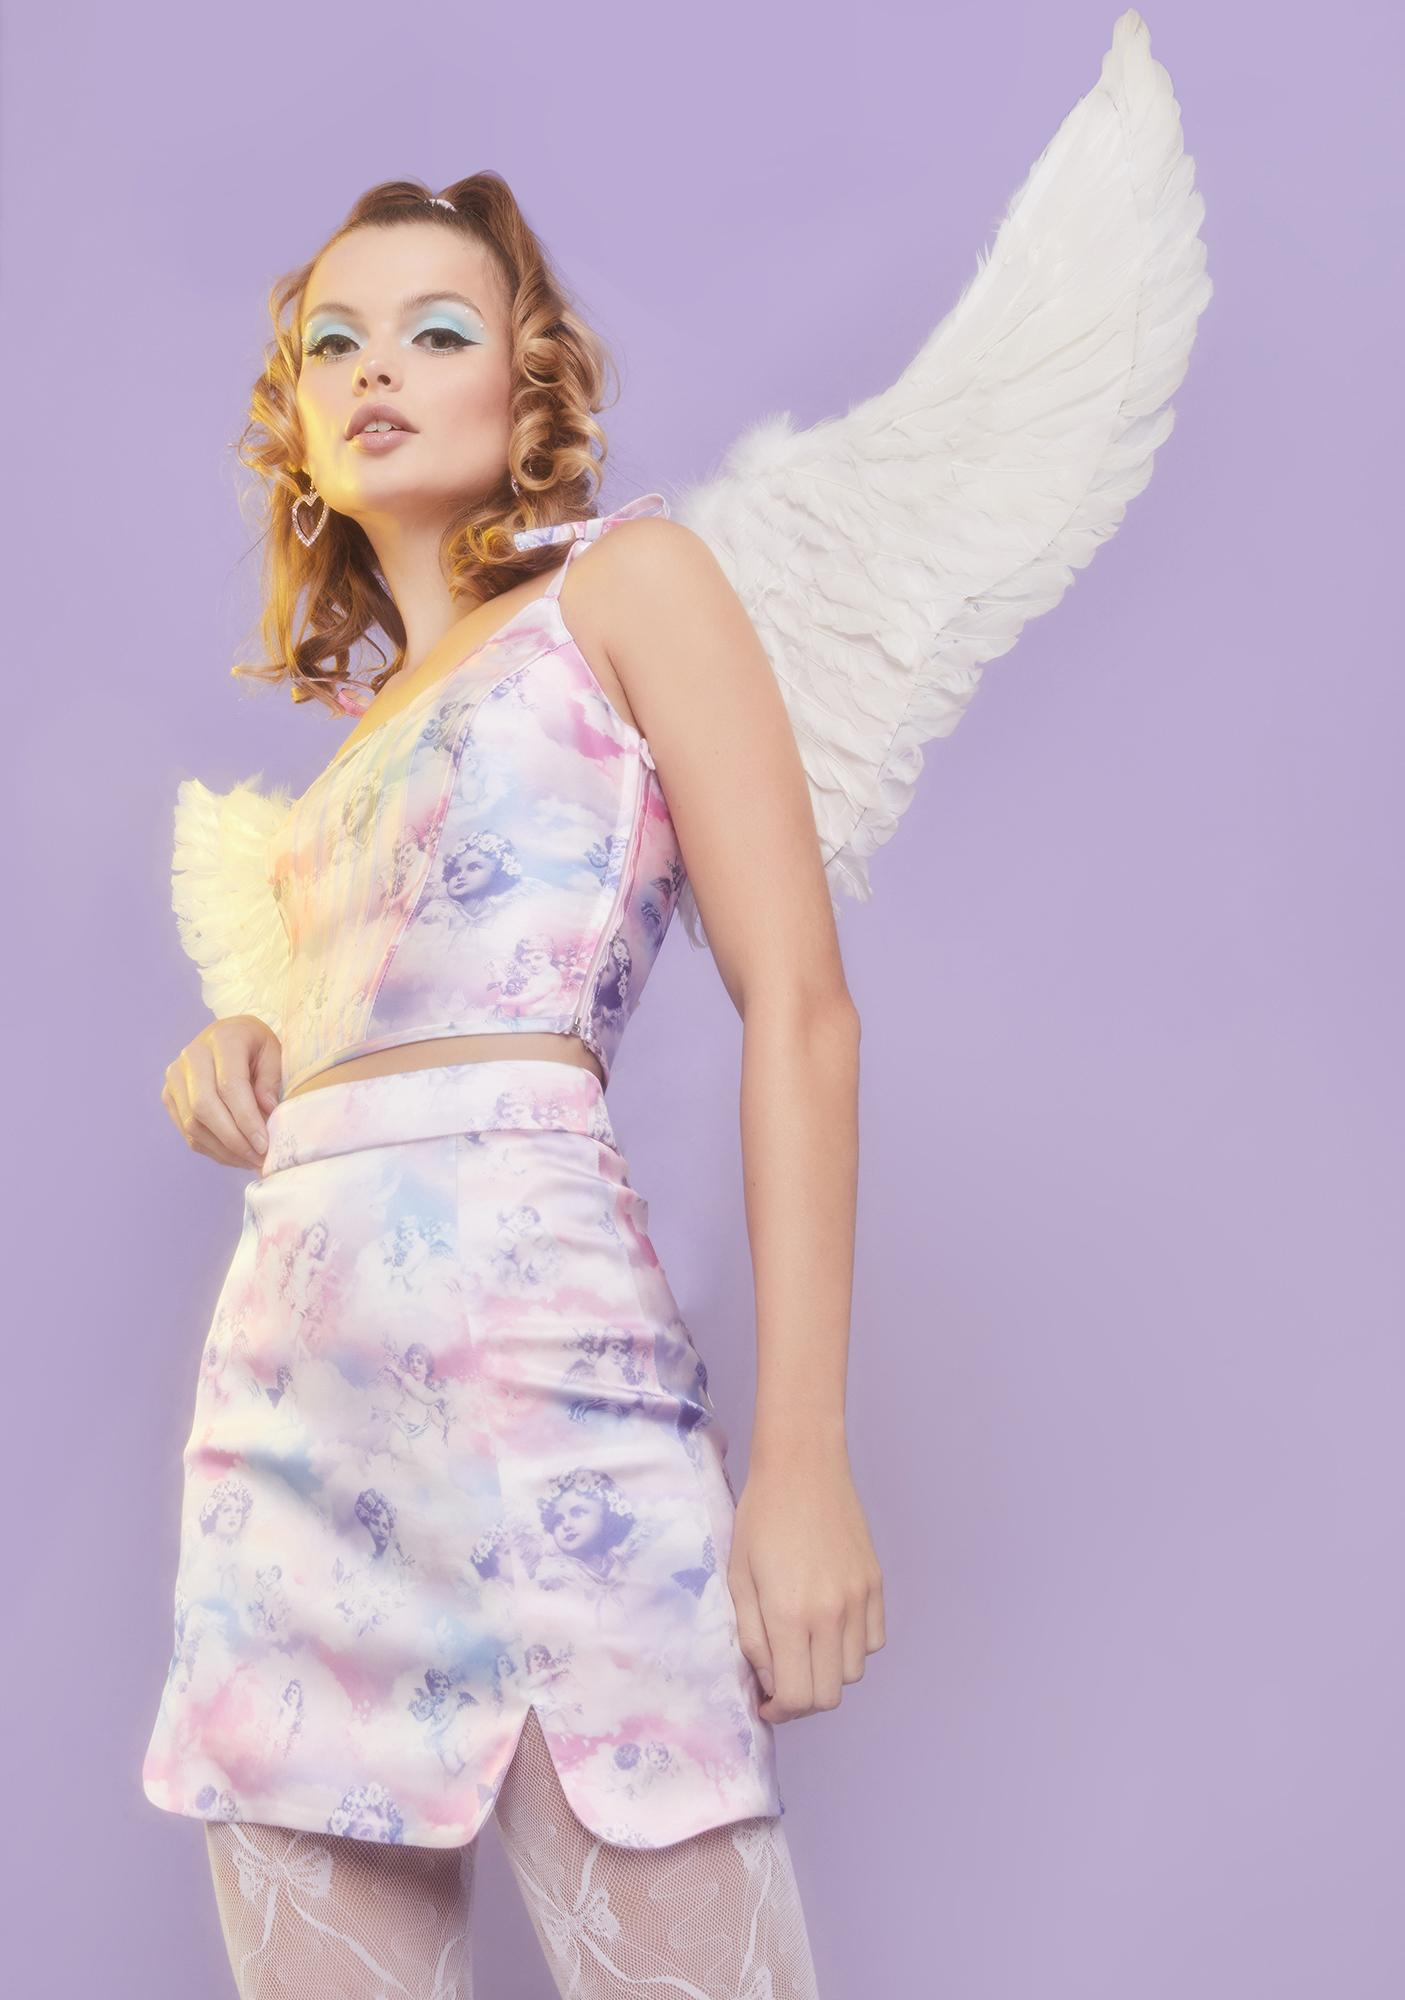 Sugar Thrillz On Cloud Nine Mini Skirt